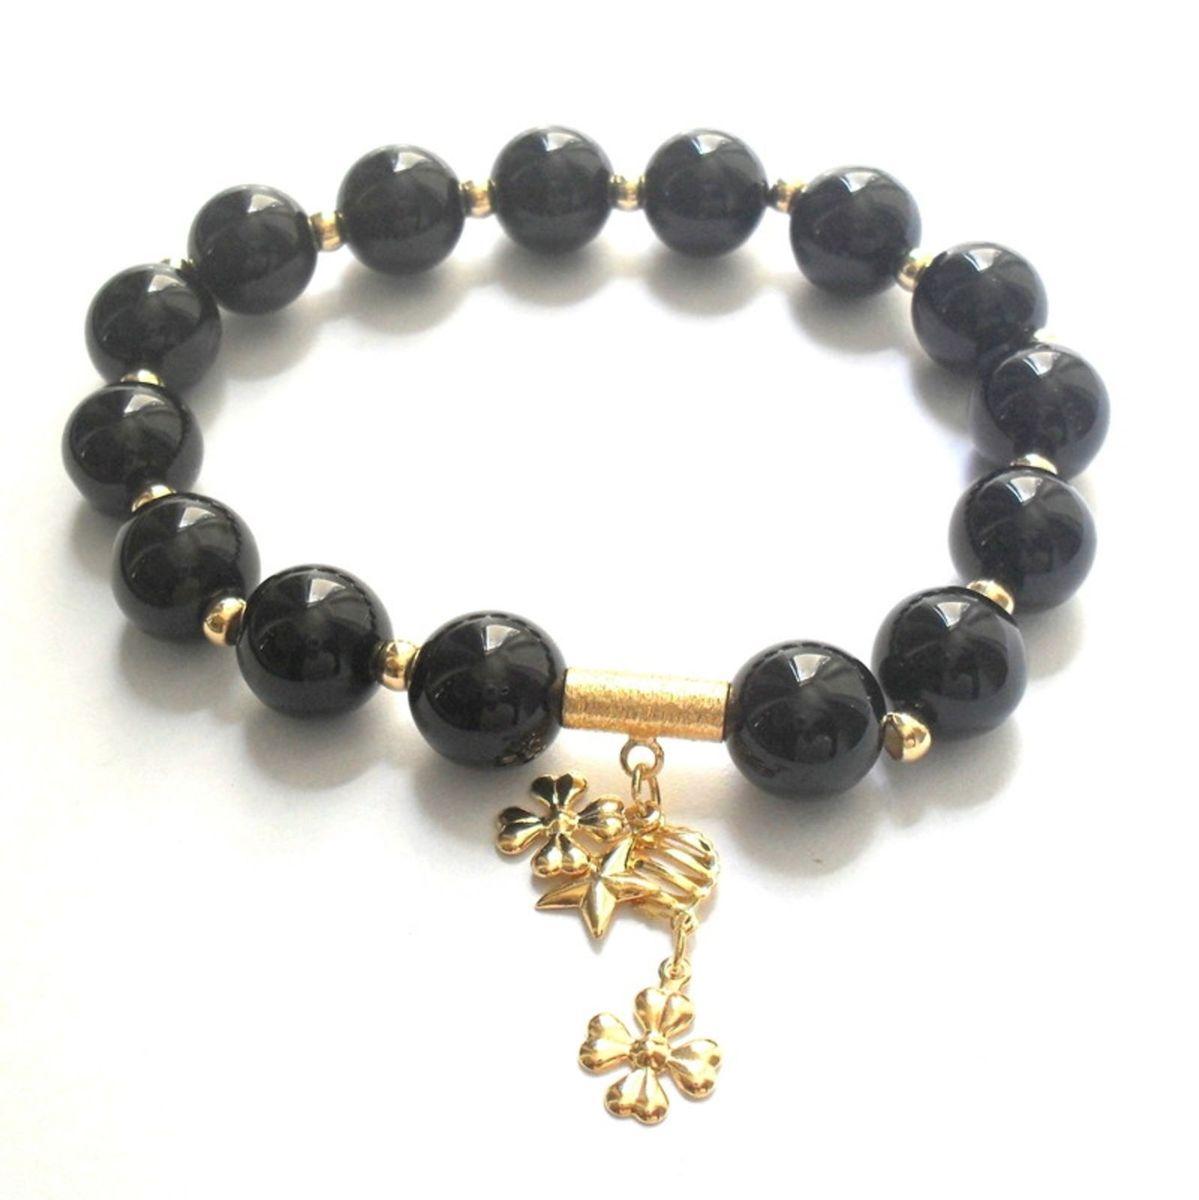 pulseira pedra natural ágata negra - bijoux propria